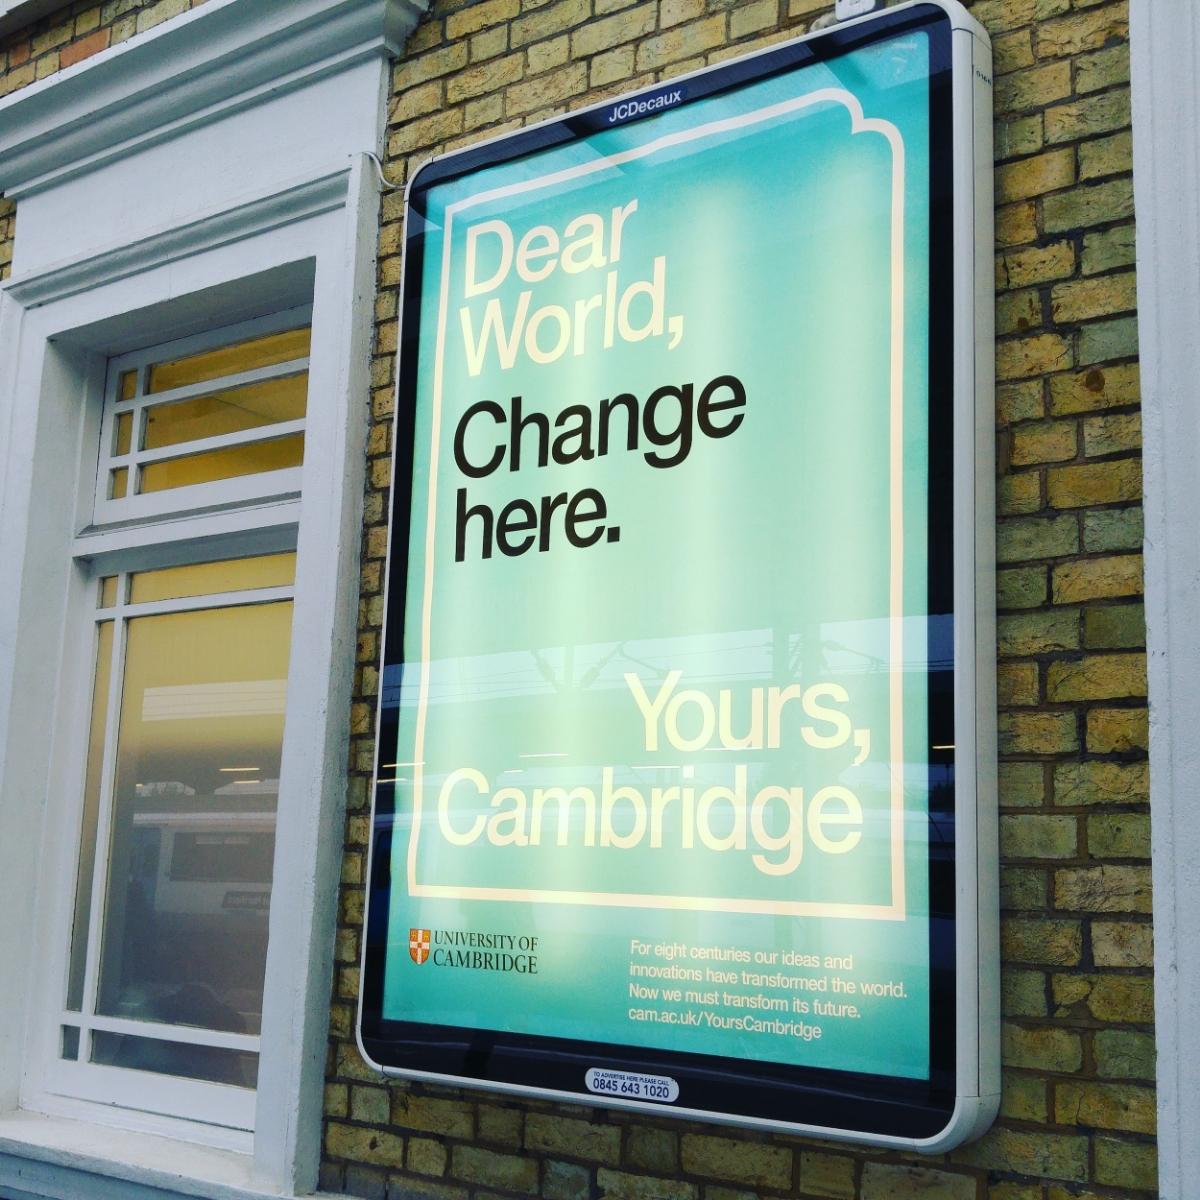 Dear Cambridge, change here